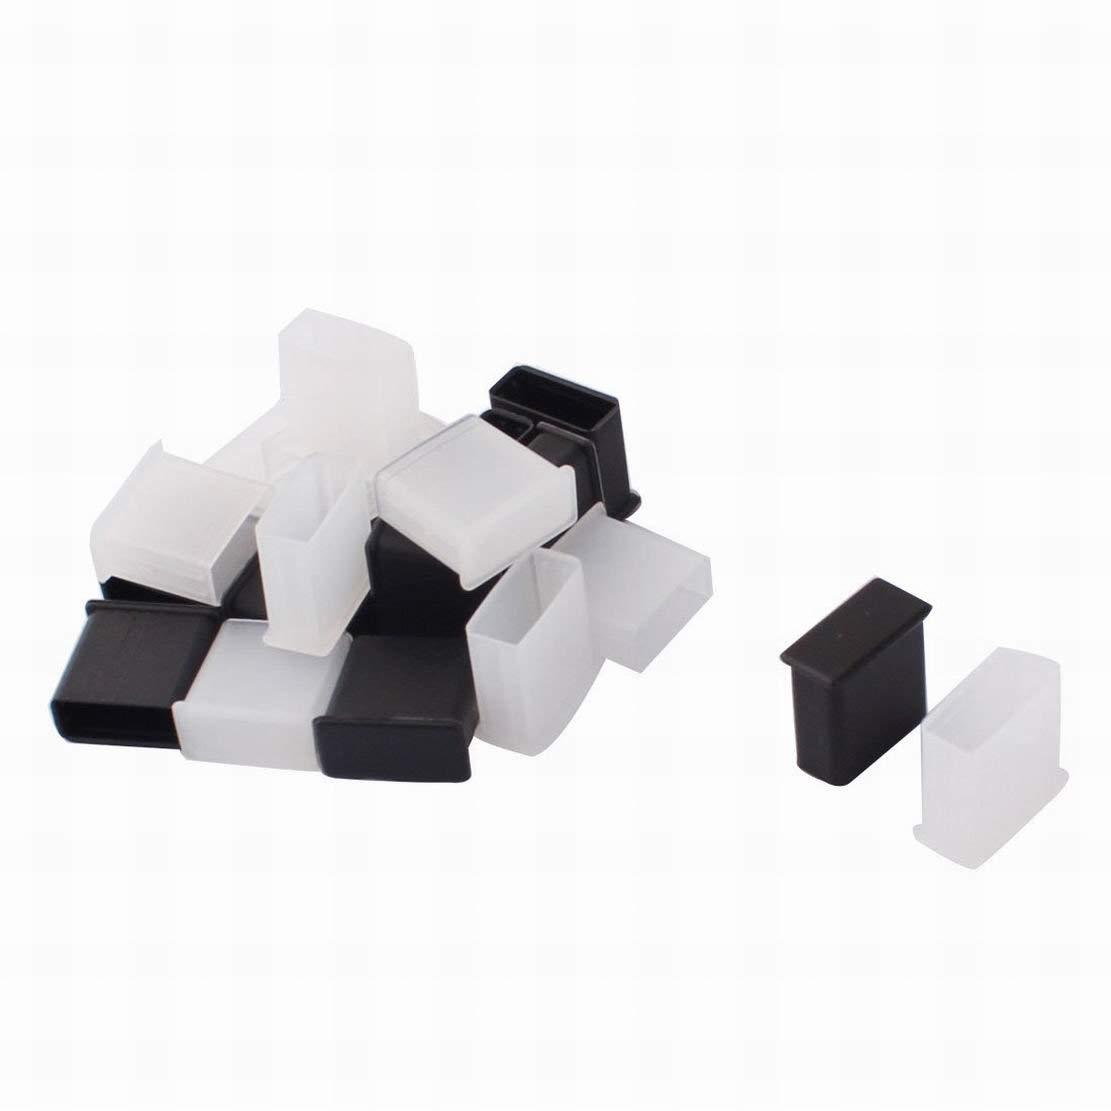 RiteAV Dust Cap Anti-Dust Plugs Protective Cover Cap USB C Male Connector 10 Pack